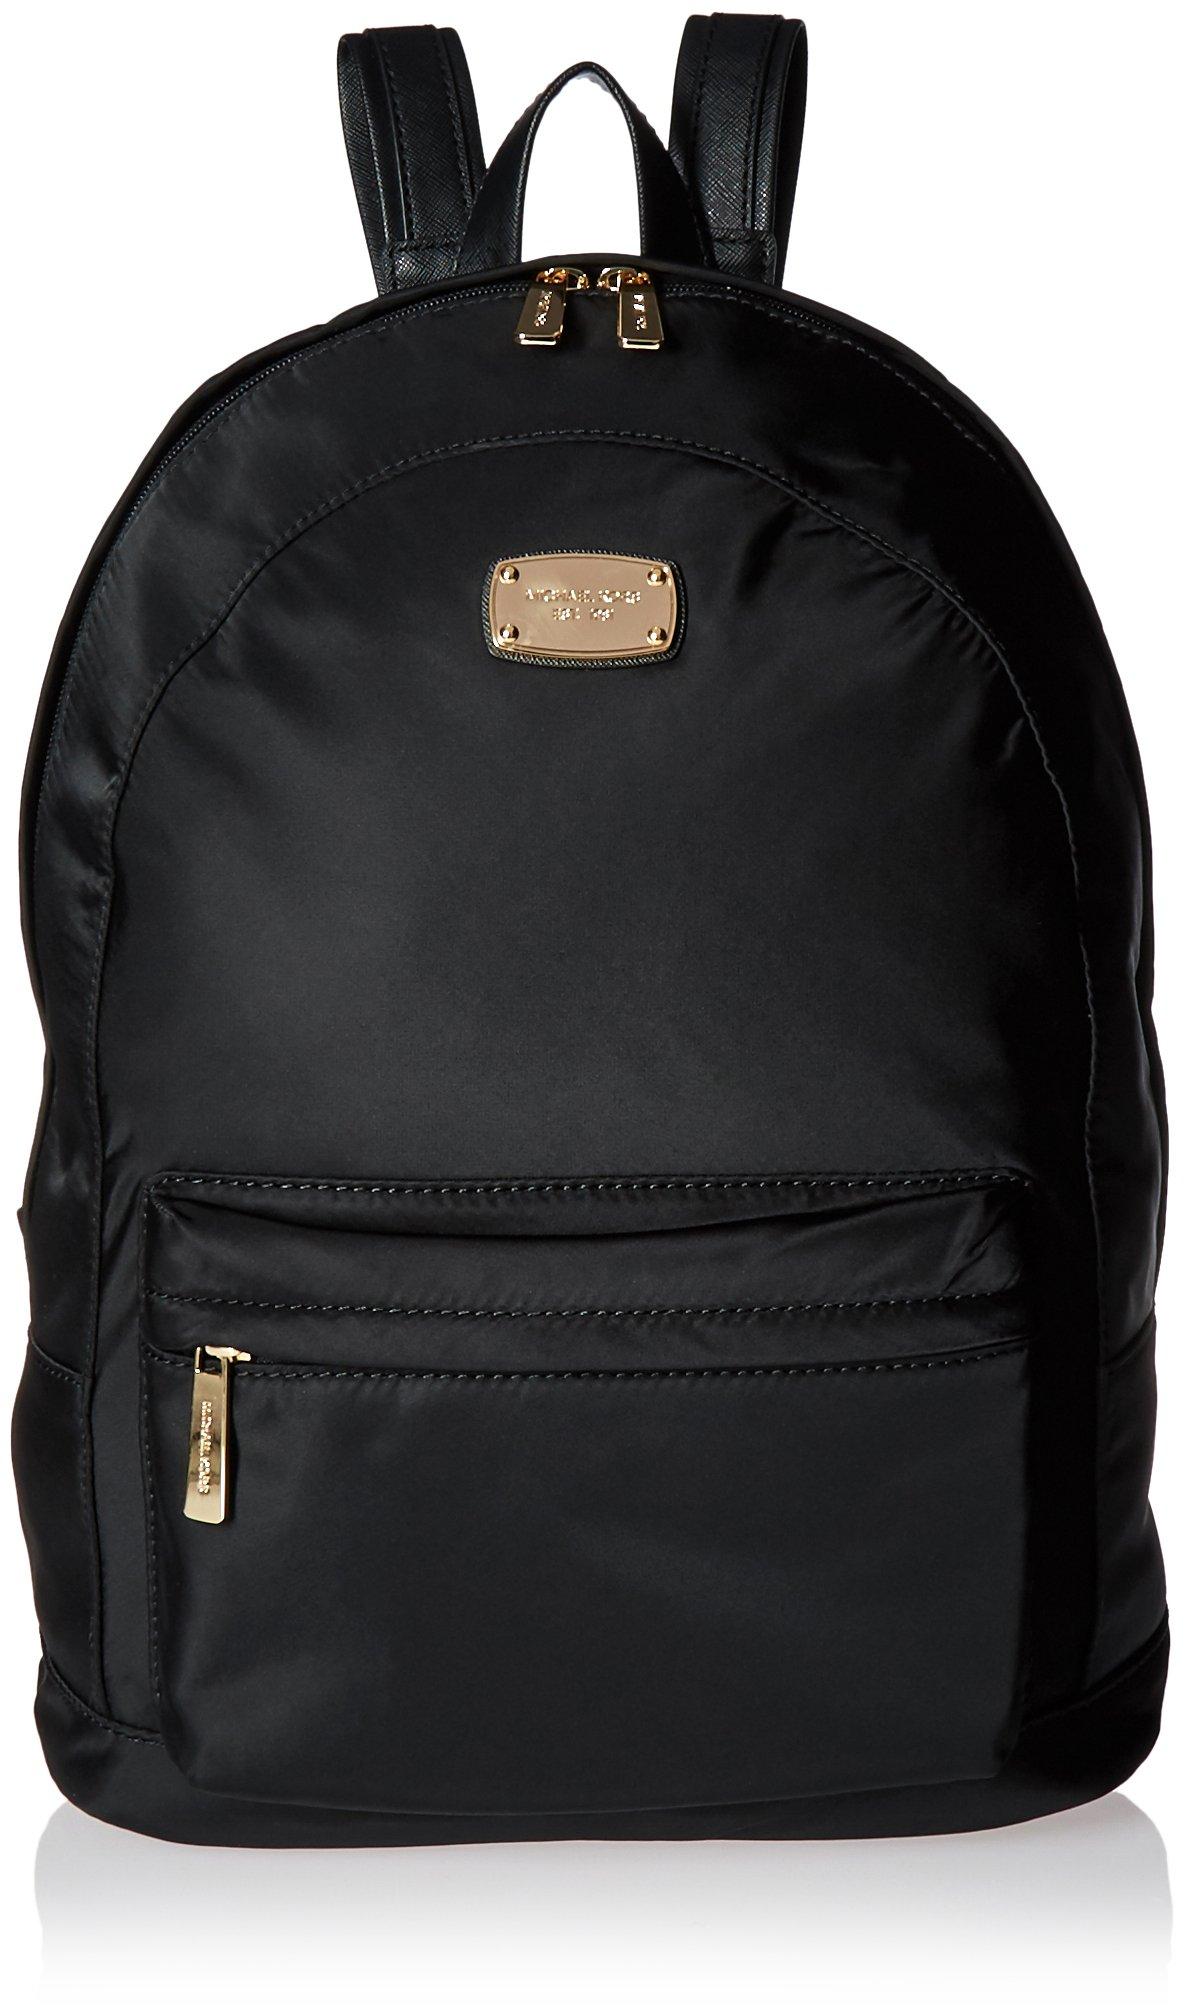 Michael Kors Jet Set Item LG Backpack Tote Handbag Purse Bag Black